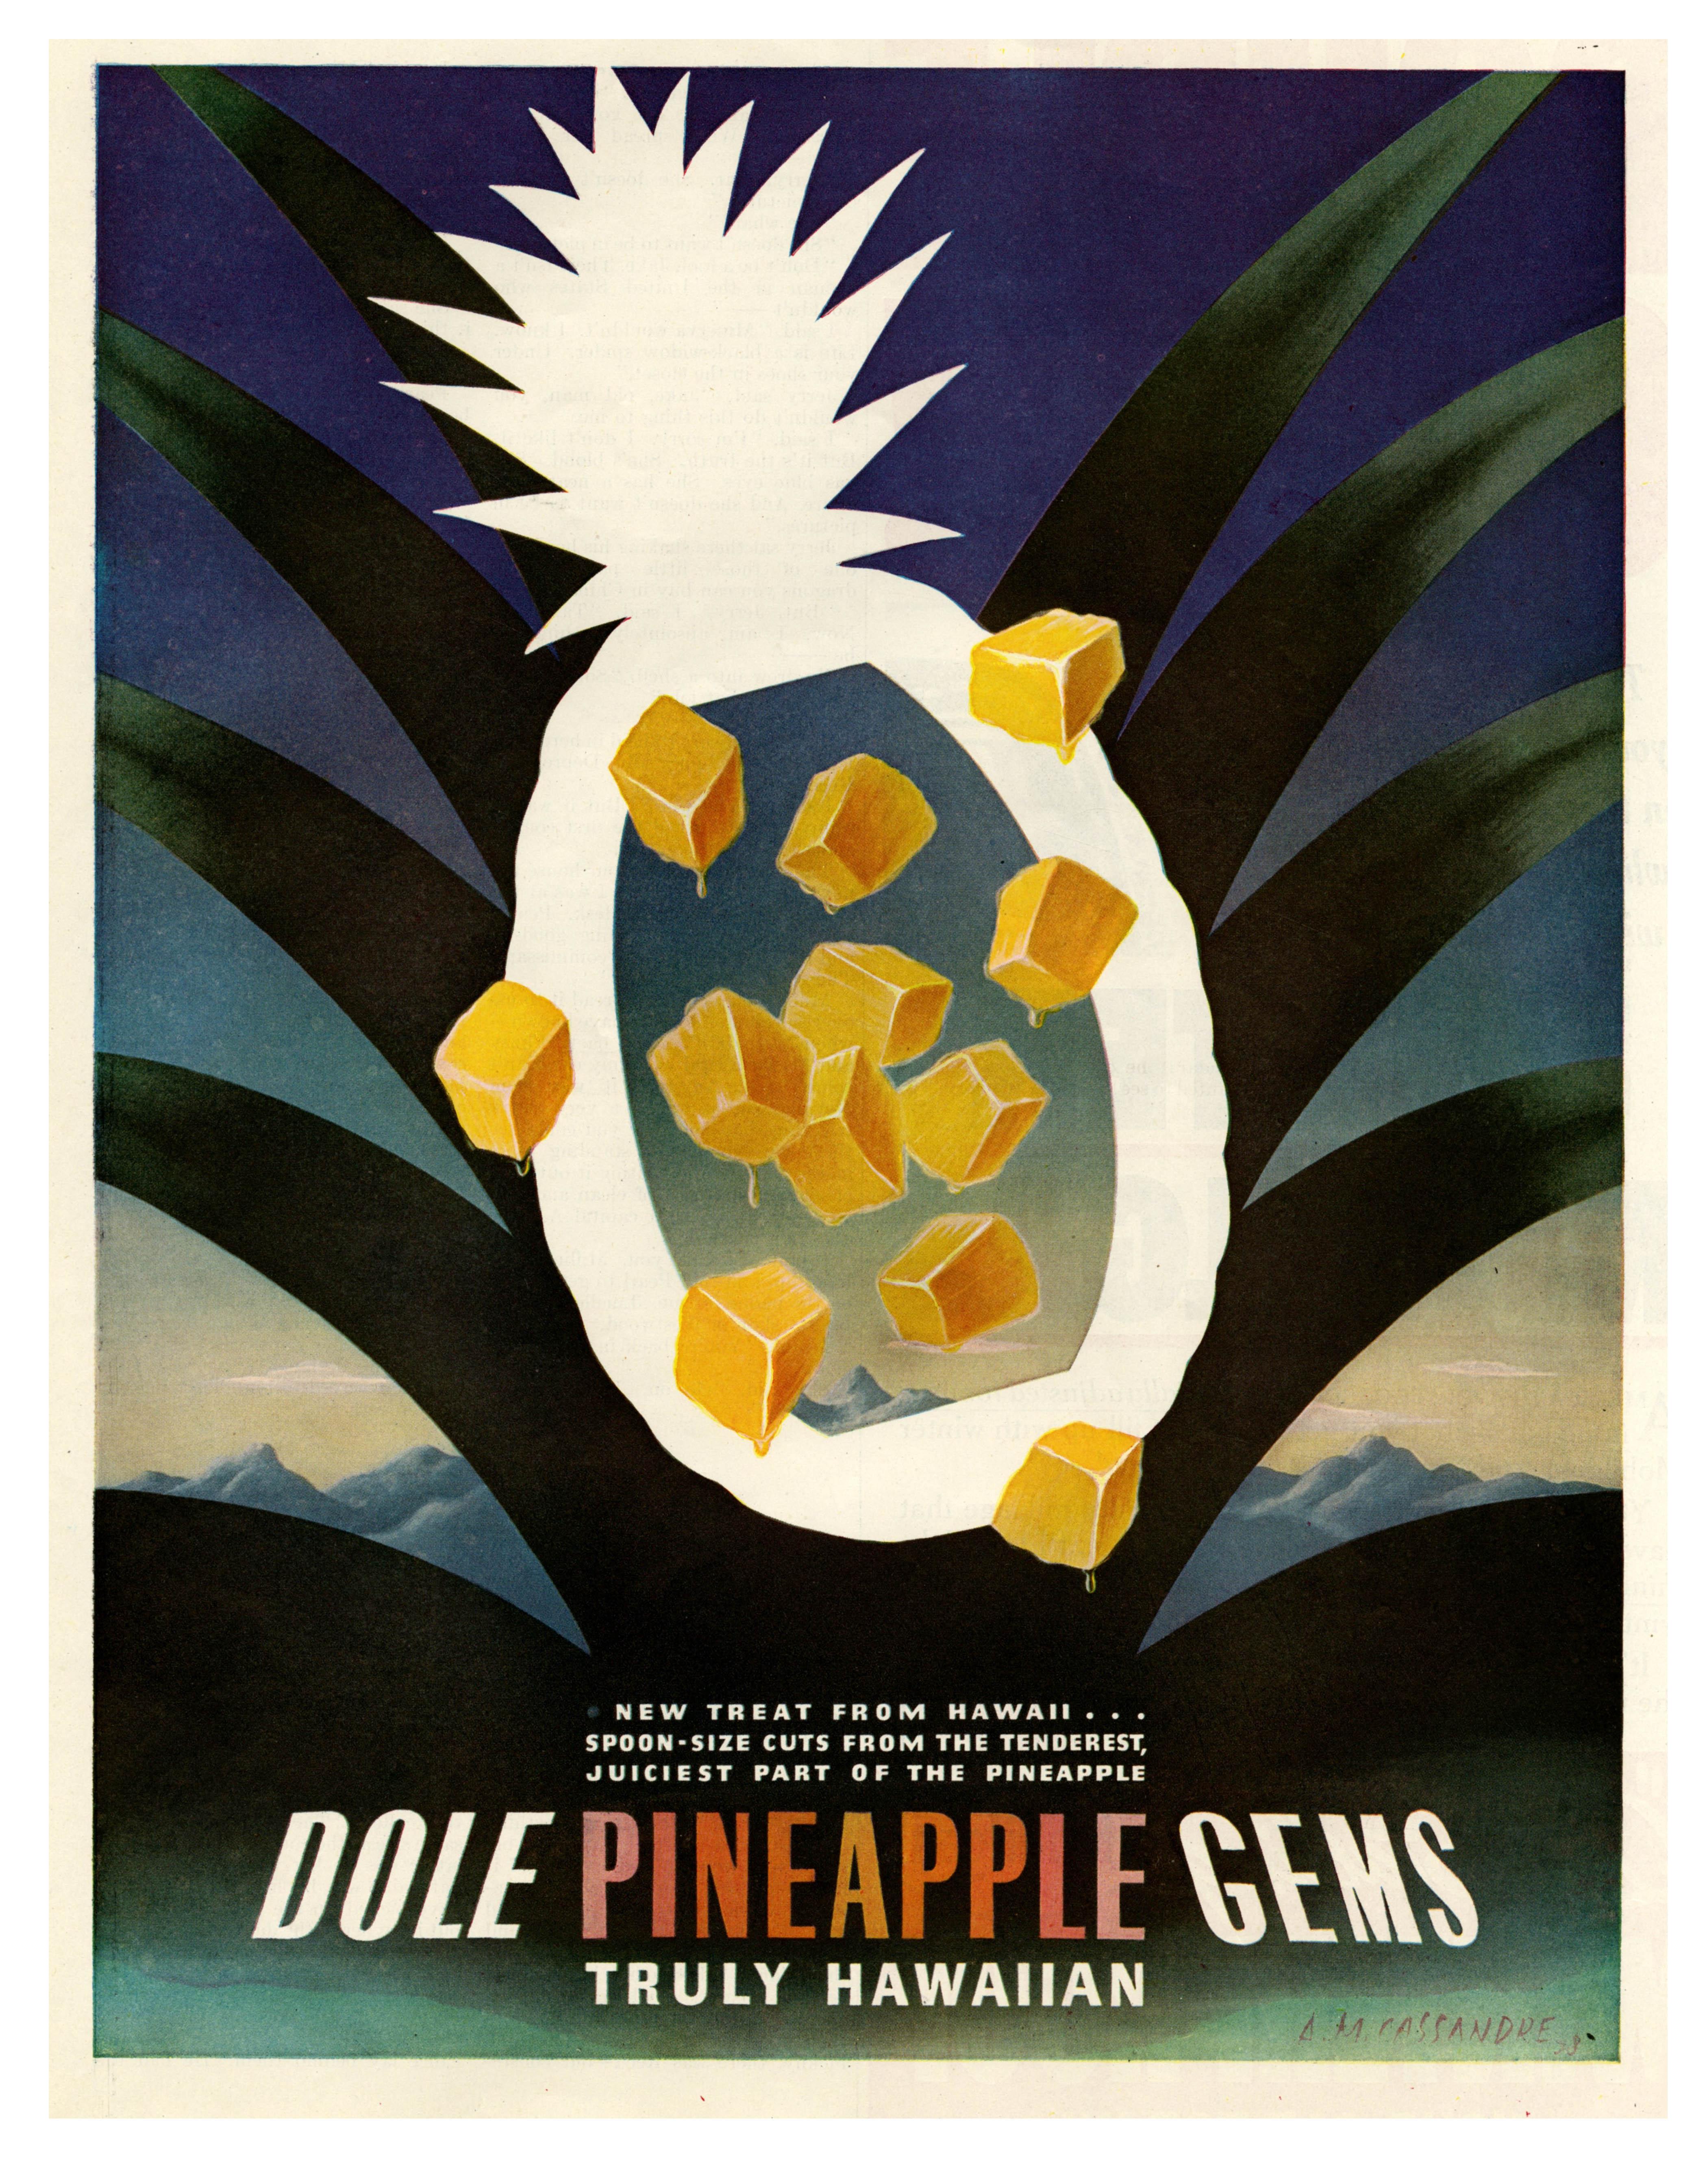 Dole Pineapple Gems - 1938 - Artwork by Cassandre